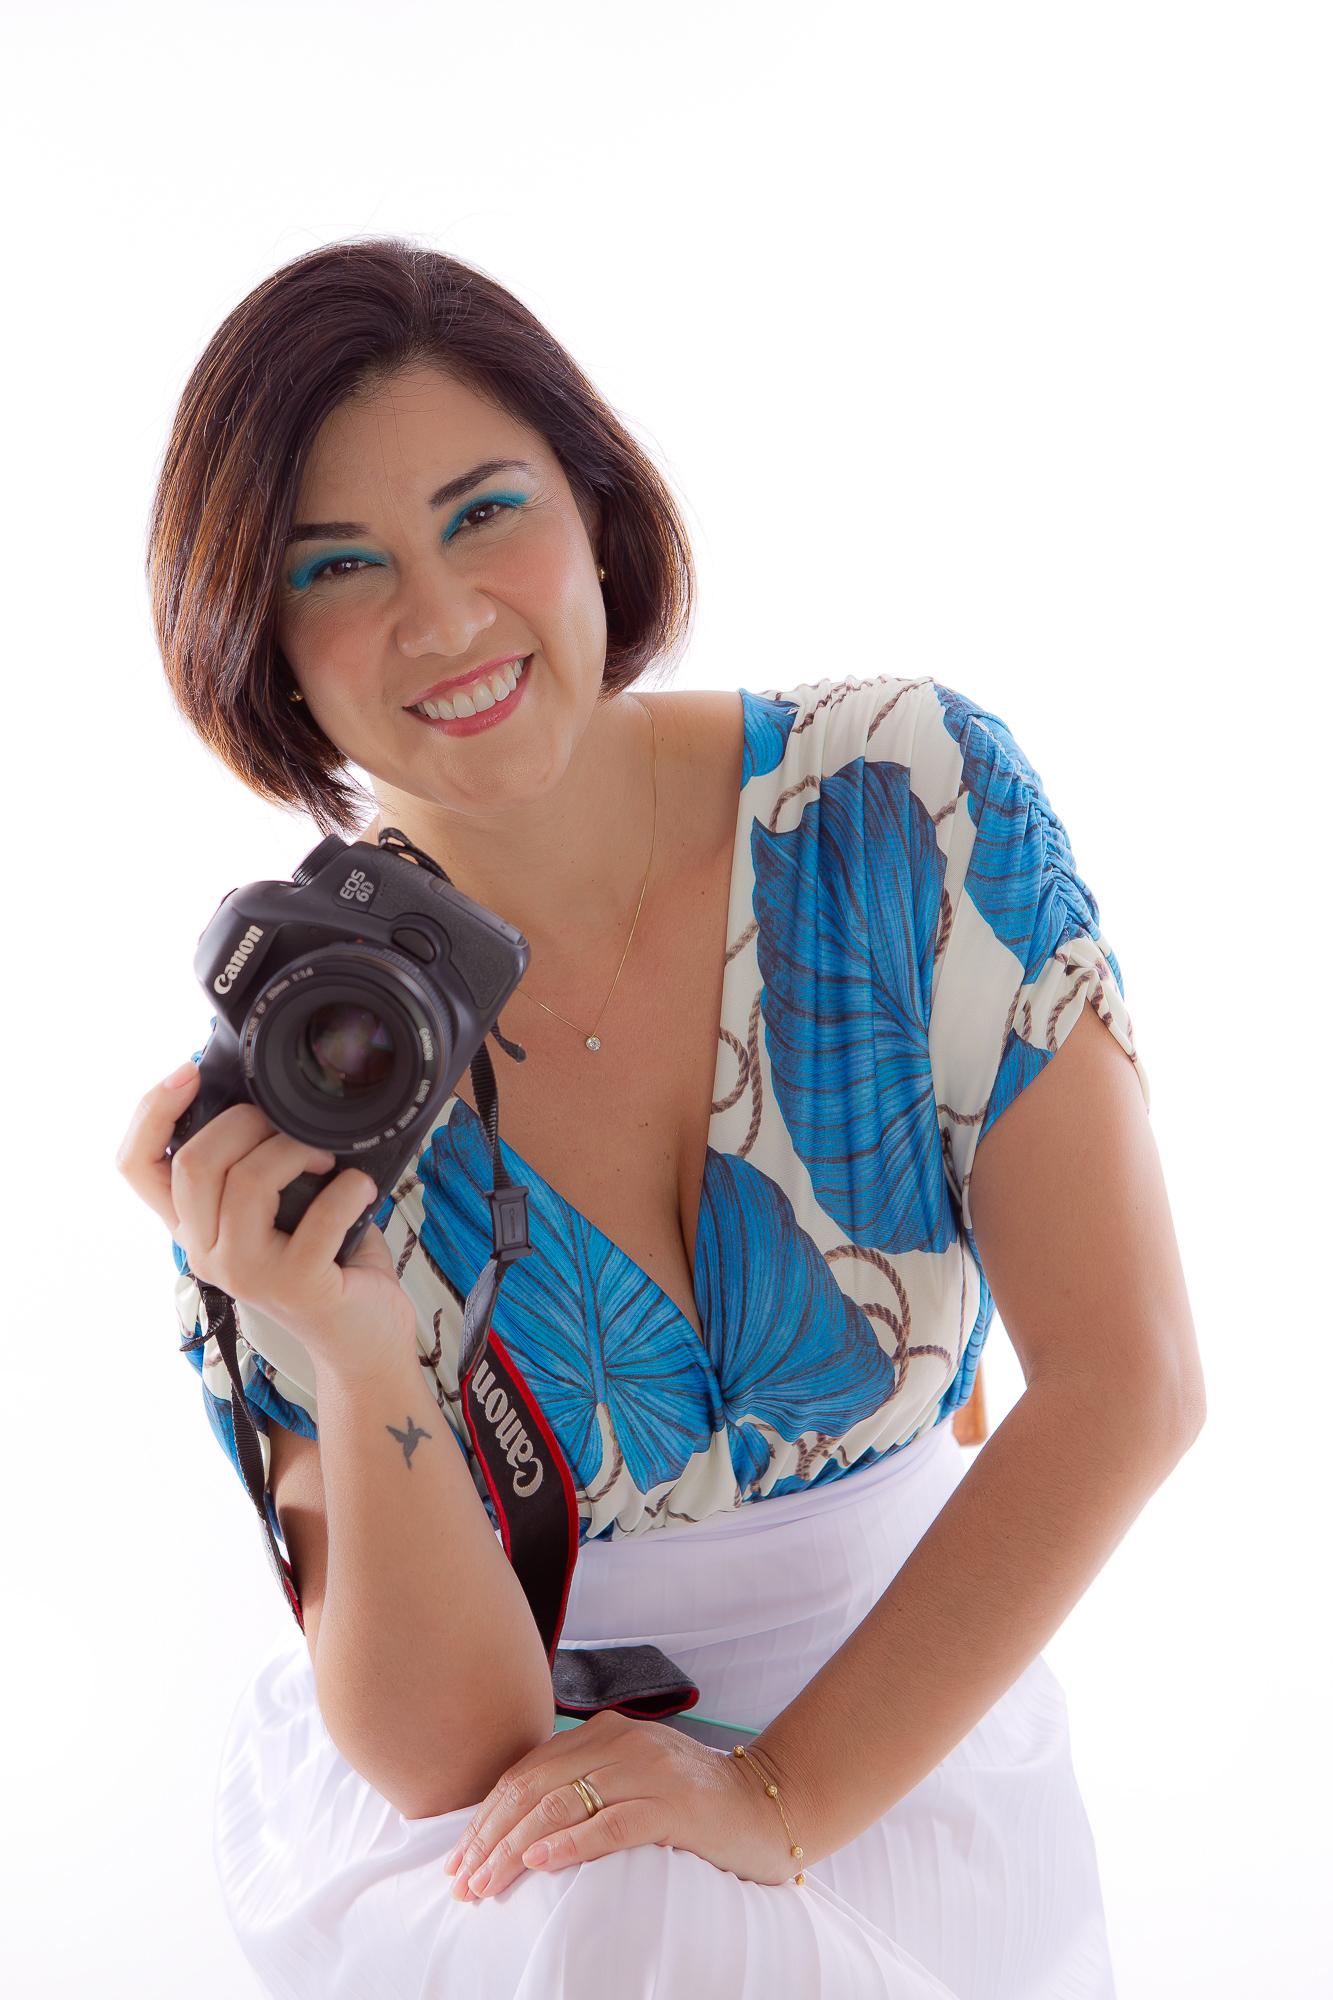 Sobre Alexandra Yamakami Fotografia